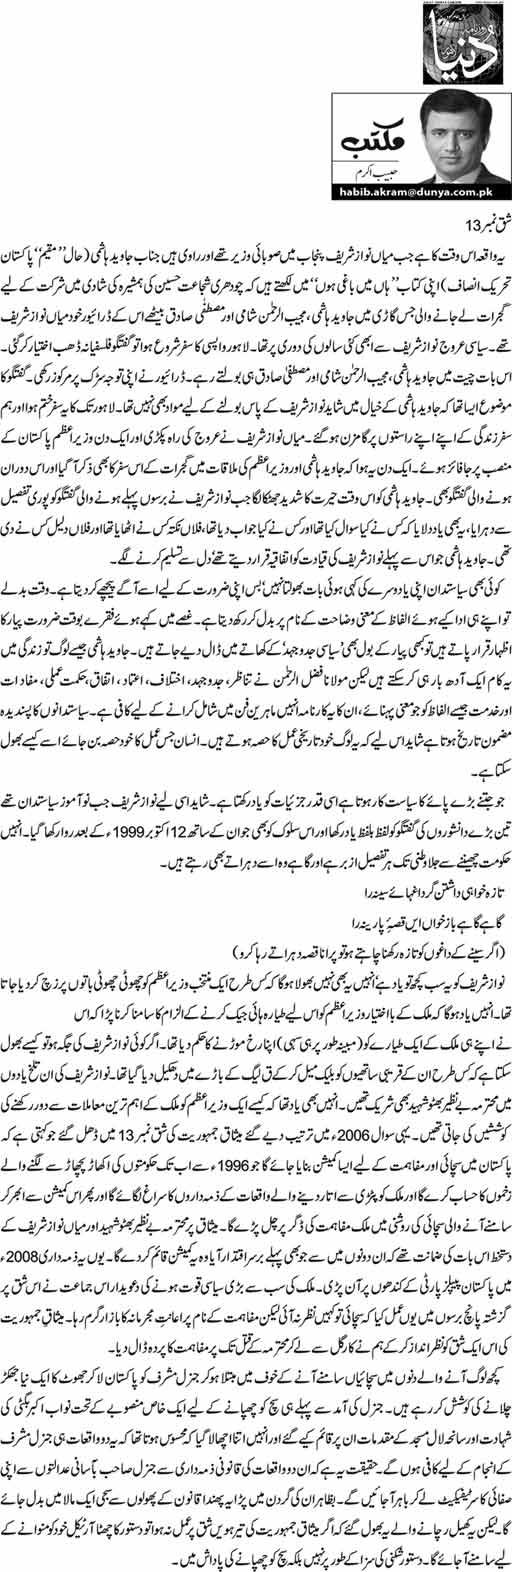 Shiq Number 13 - Habib Akram